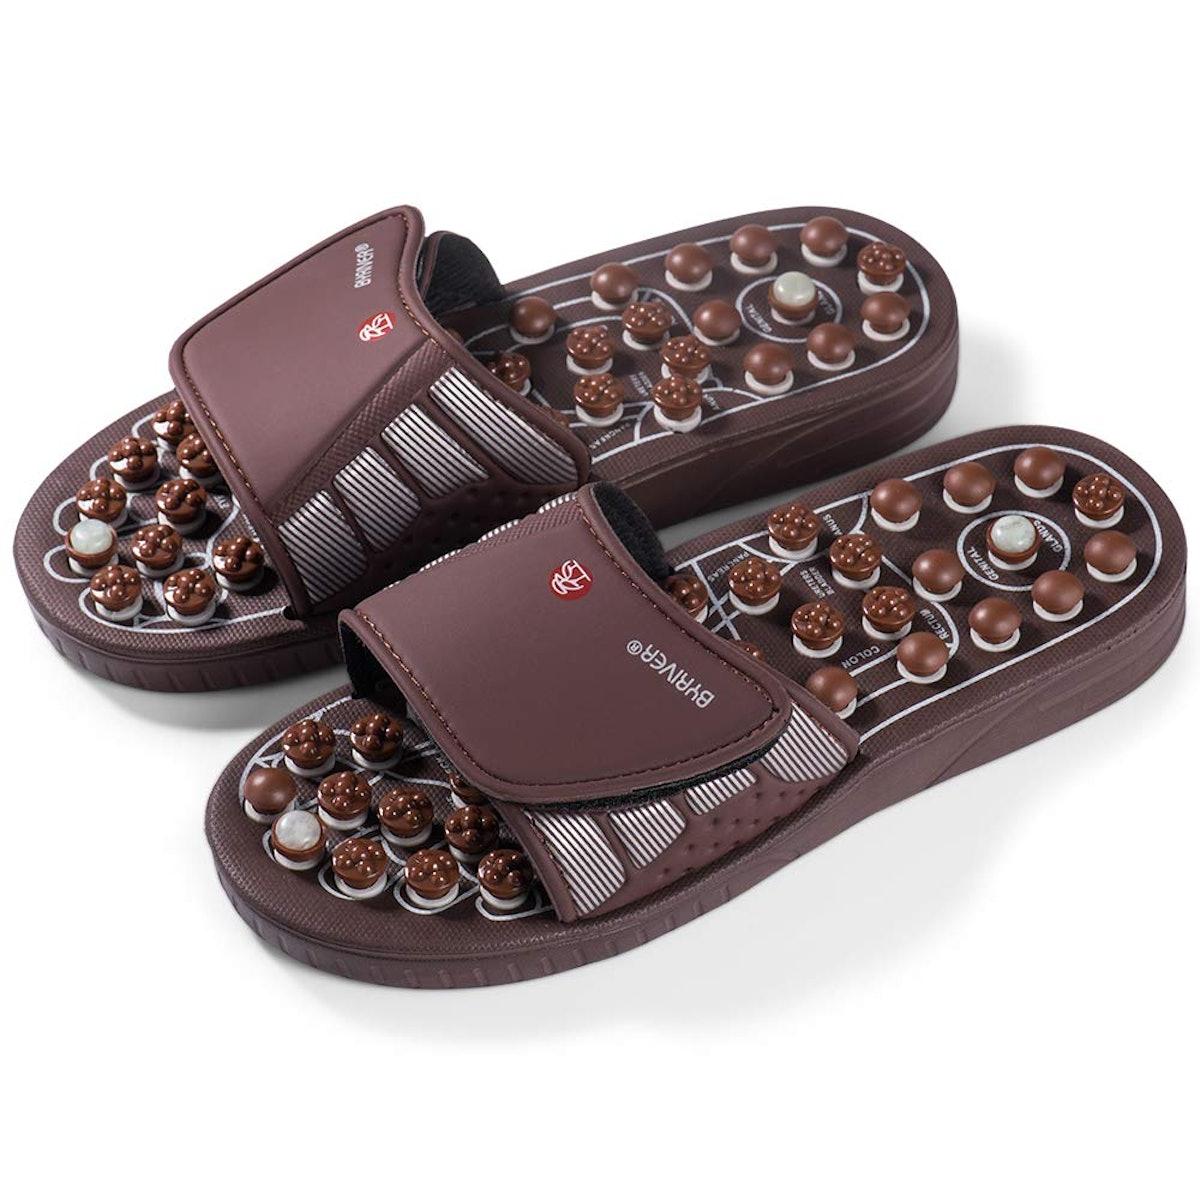 BYRIVER Indoor Massage Slippers Shoes